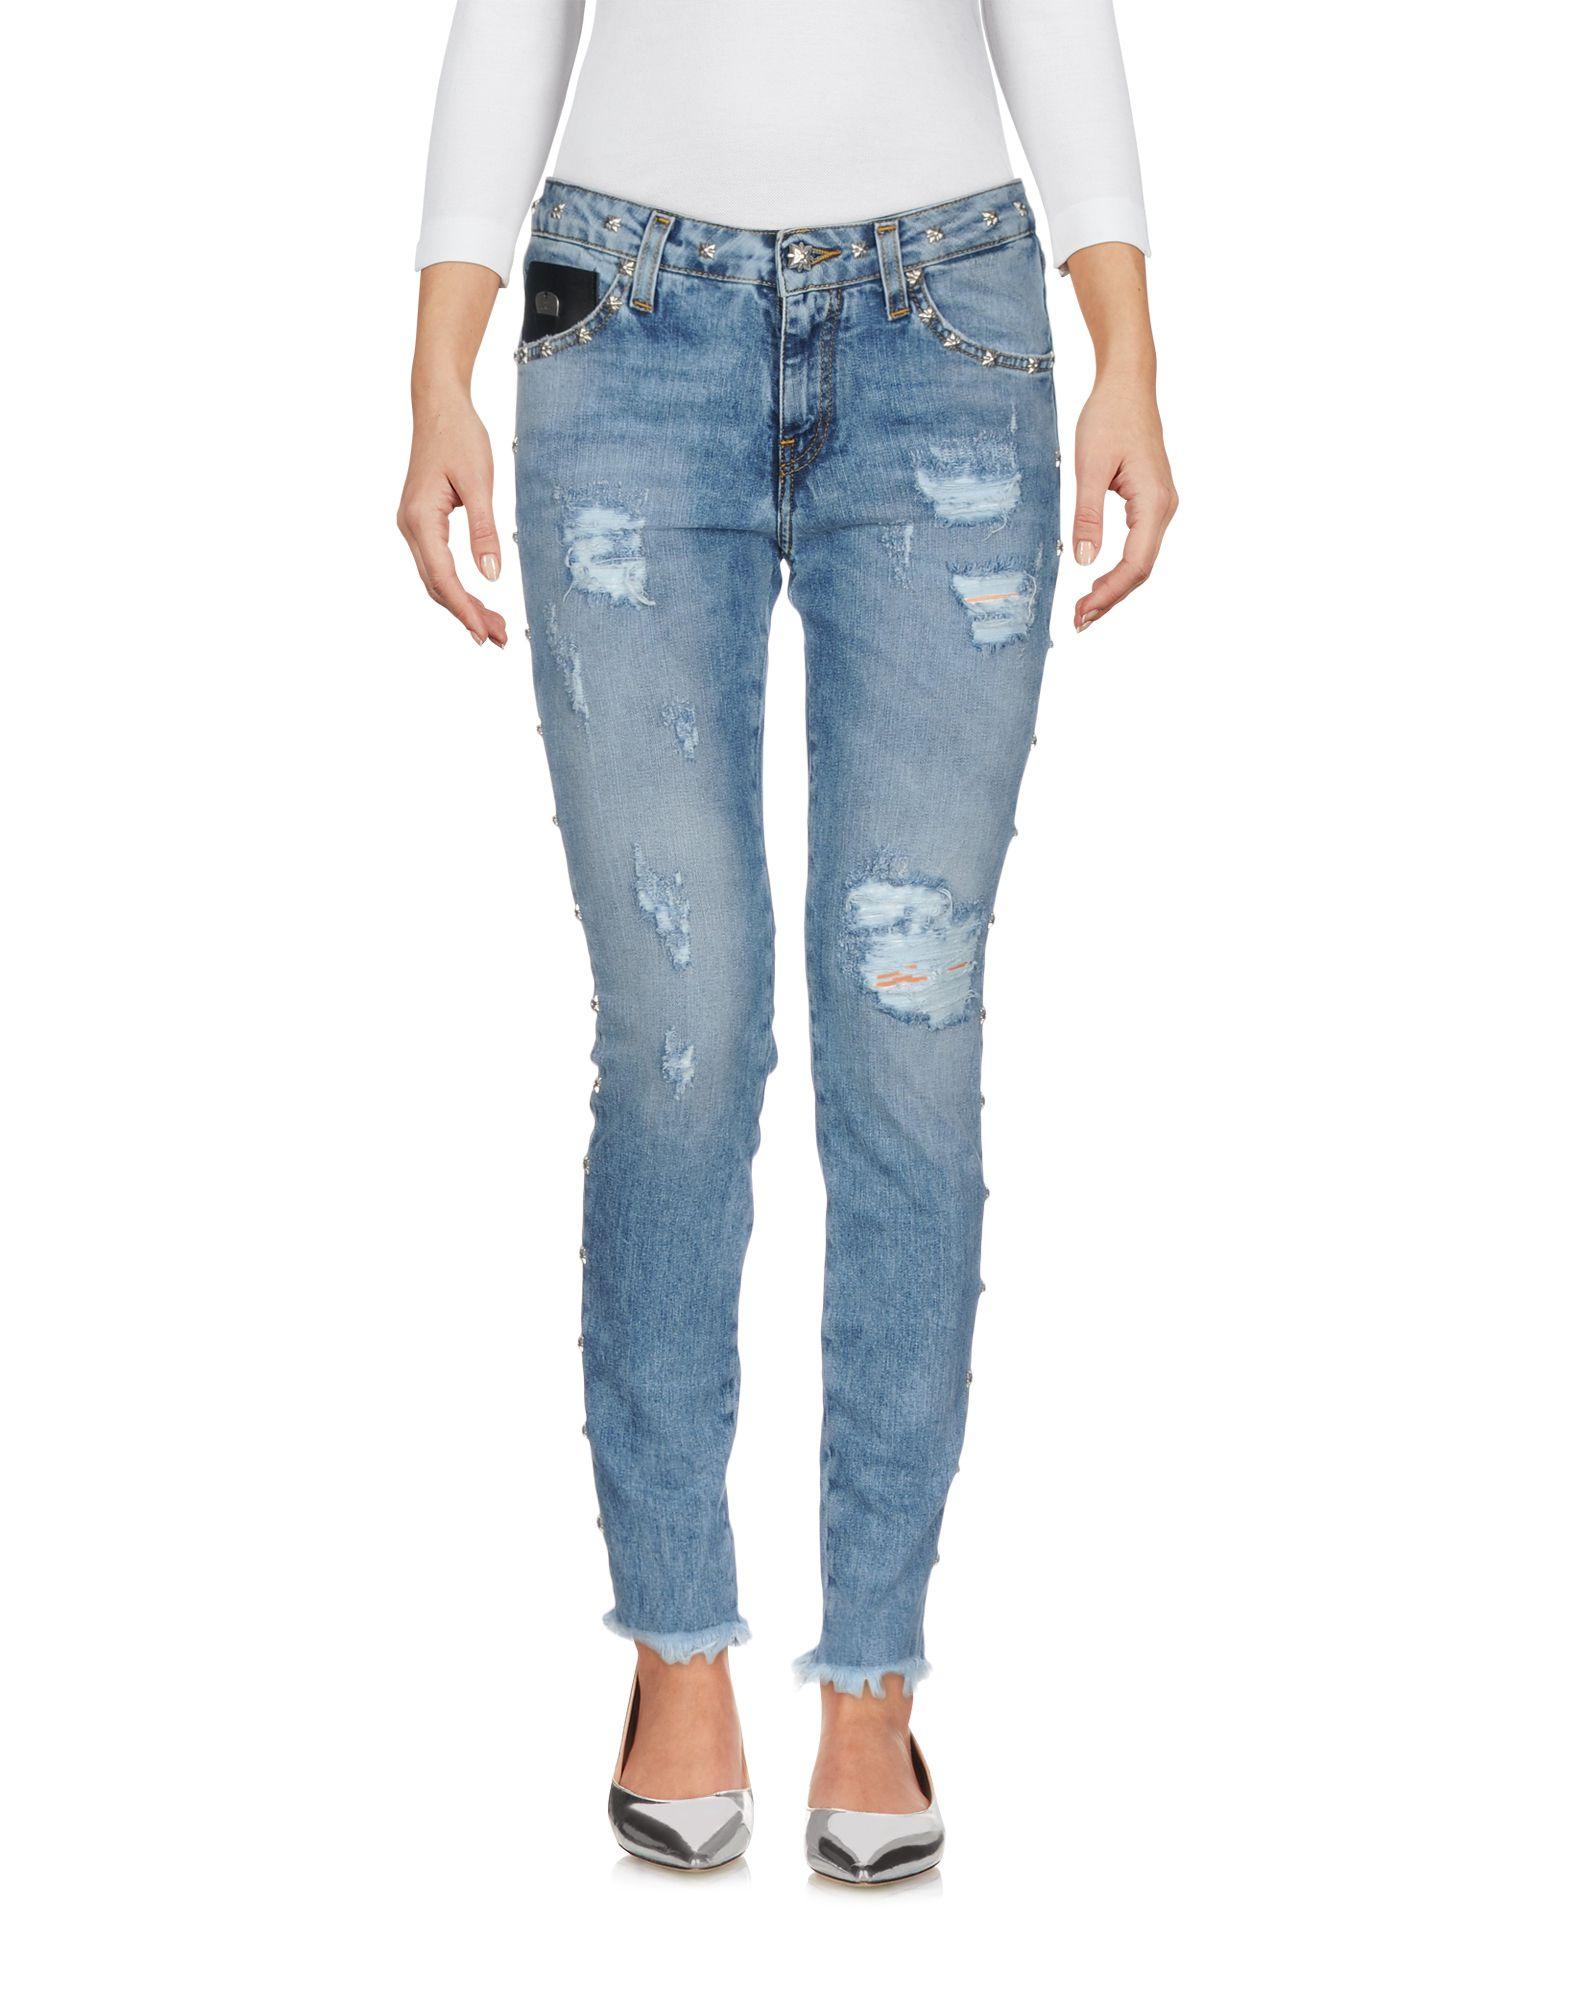 Pantaloni Jeans John Richmond Donna - Acquista online su 0t62I